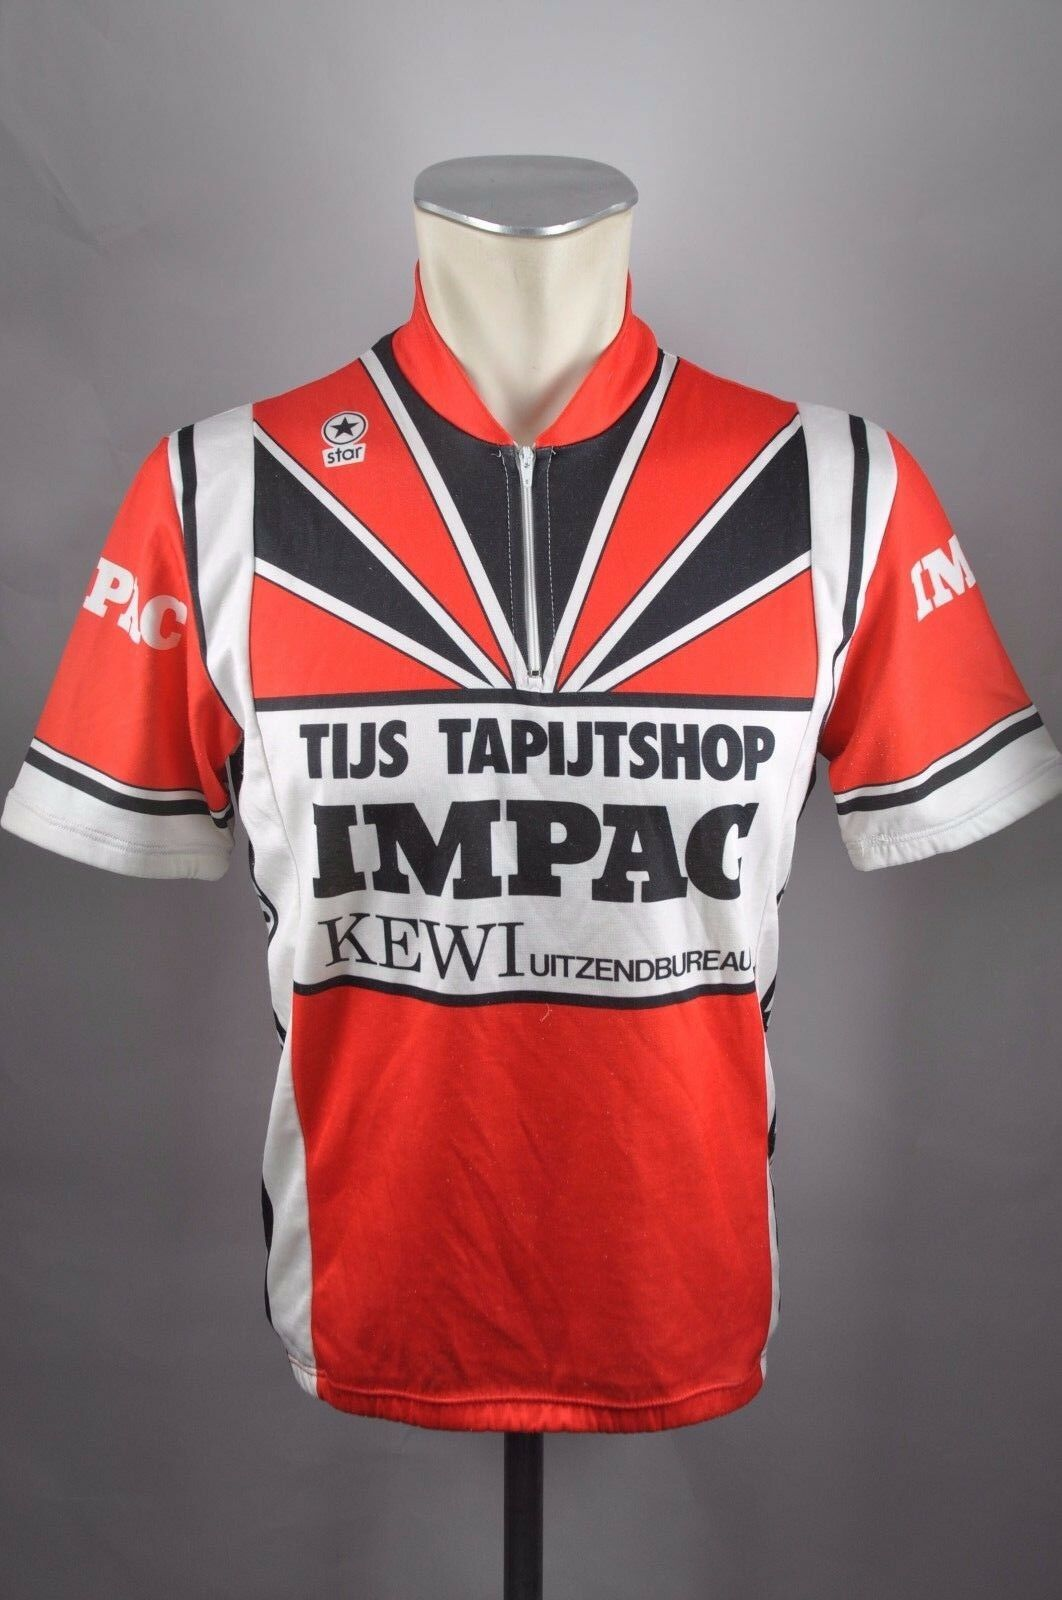 Impac Star tijs tapijtshop cycling jersey Bike Rad Trikot Gr. M 54cm U9